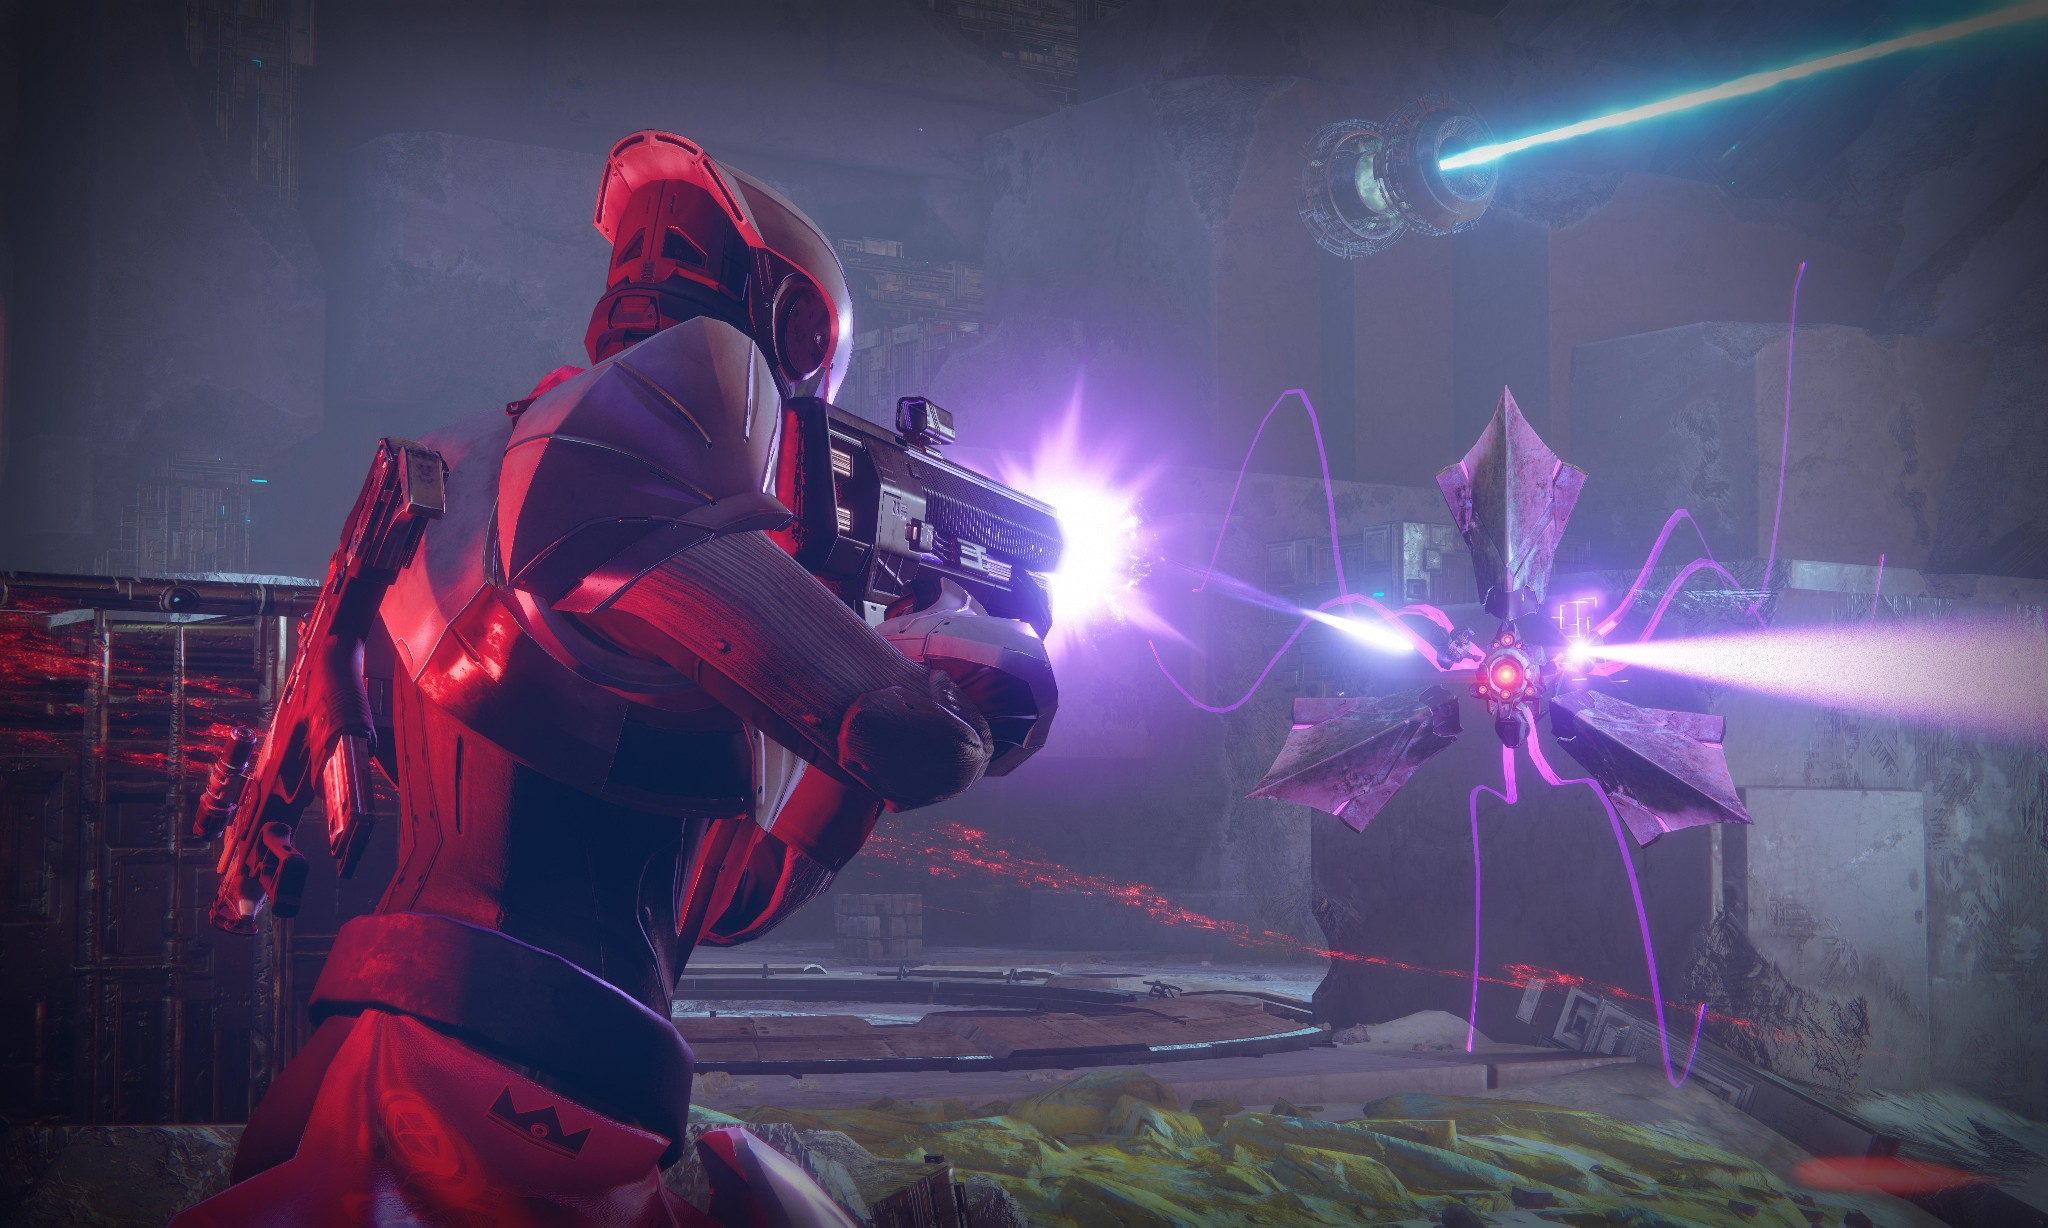 Destiny 2 review: shooting aliens has never felt better